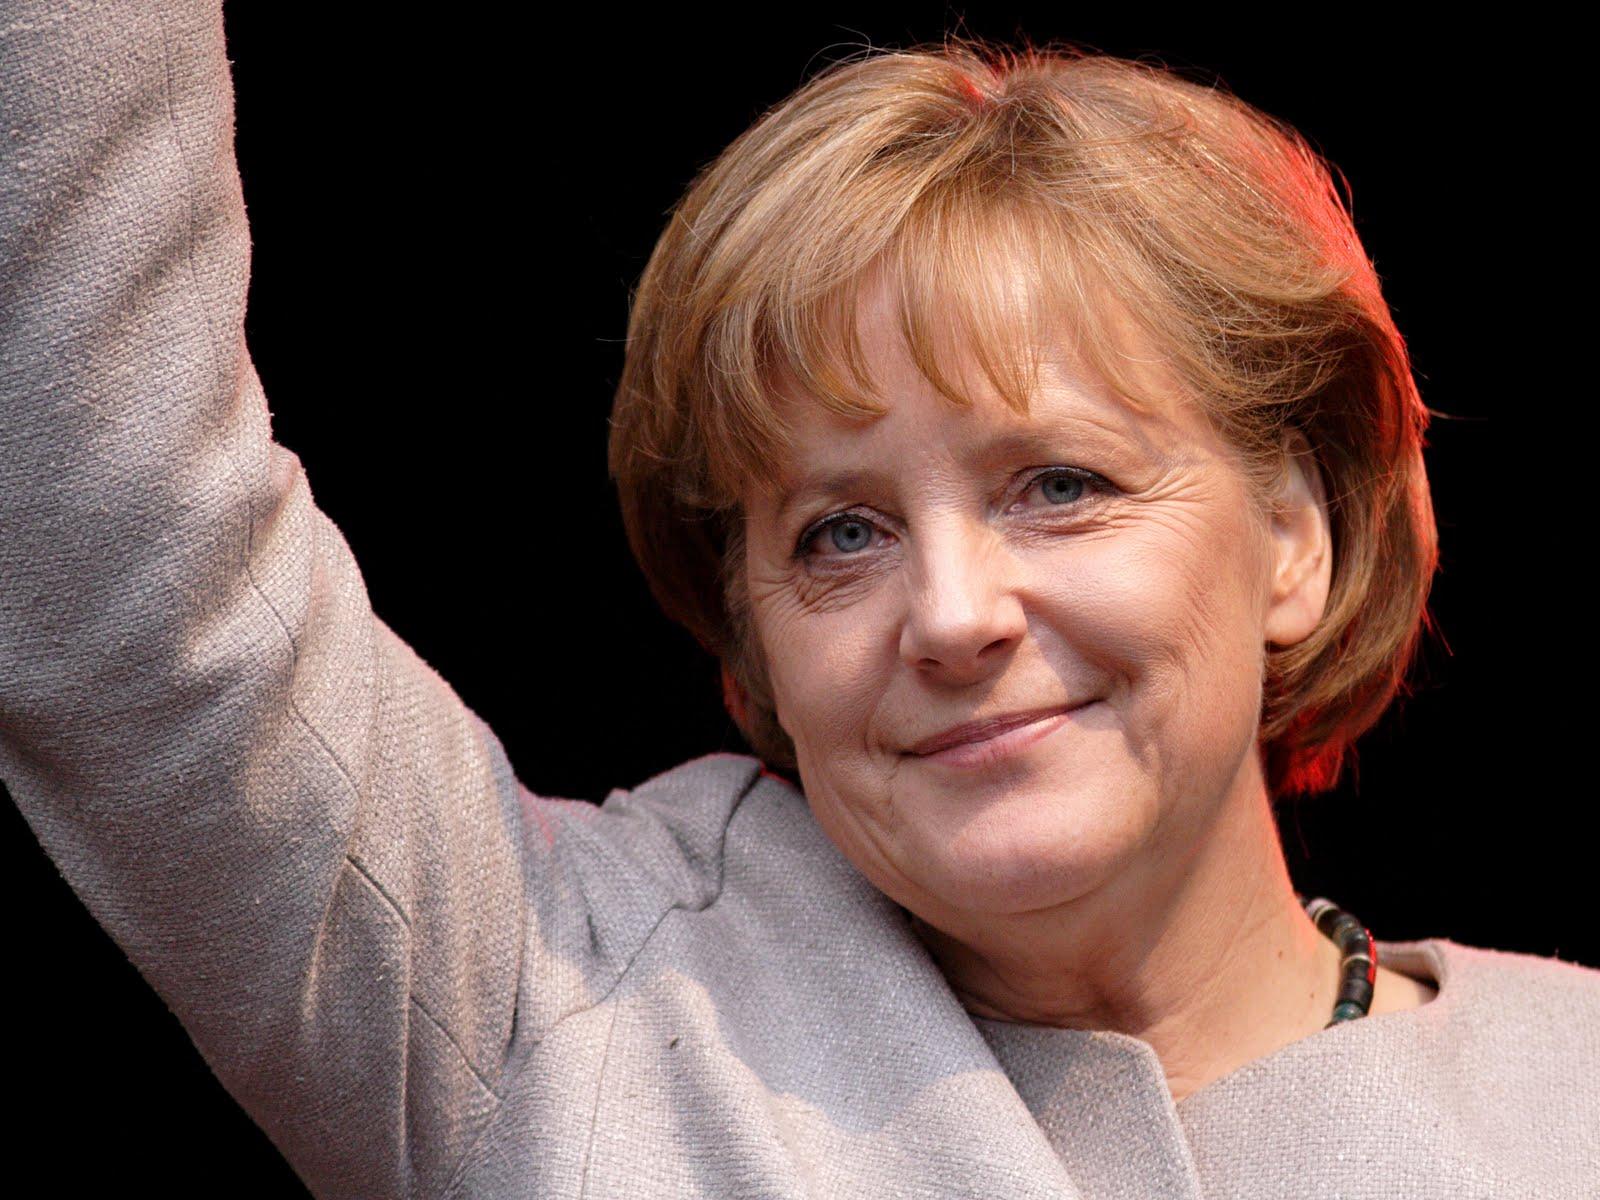 http://2.bp.blogspot.com/_jUpz57qjlFk/S9hHUUYW5-I/AAAAAAAAC0U/8A3PLxLKVGQ/s1600/Angela_Merkel_(2008).jpg